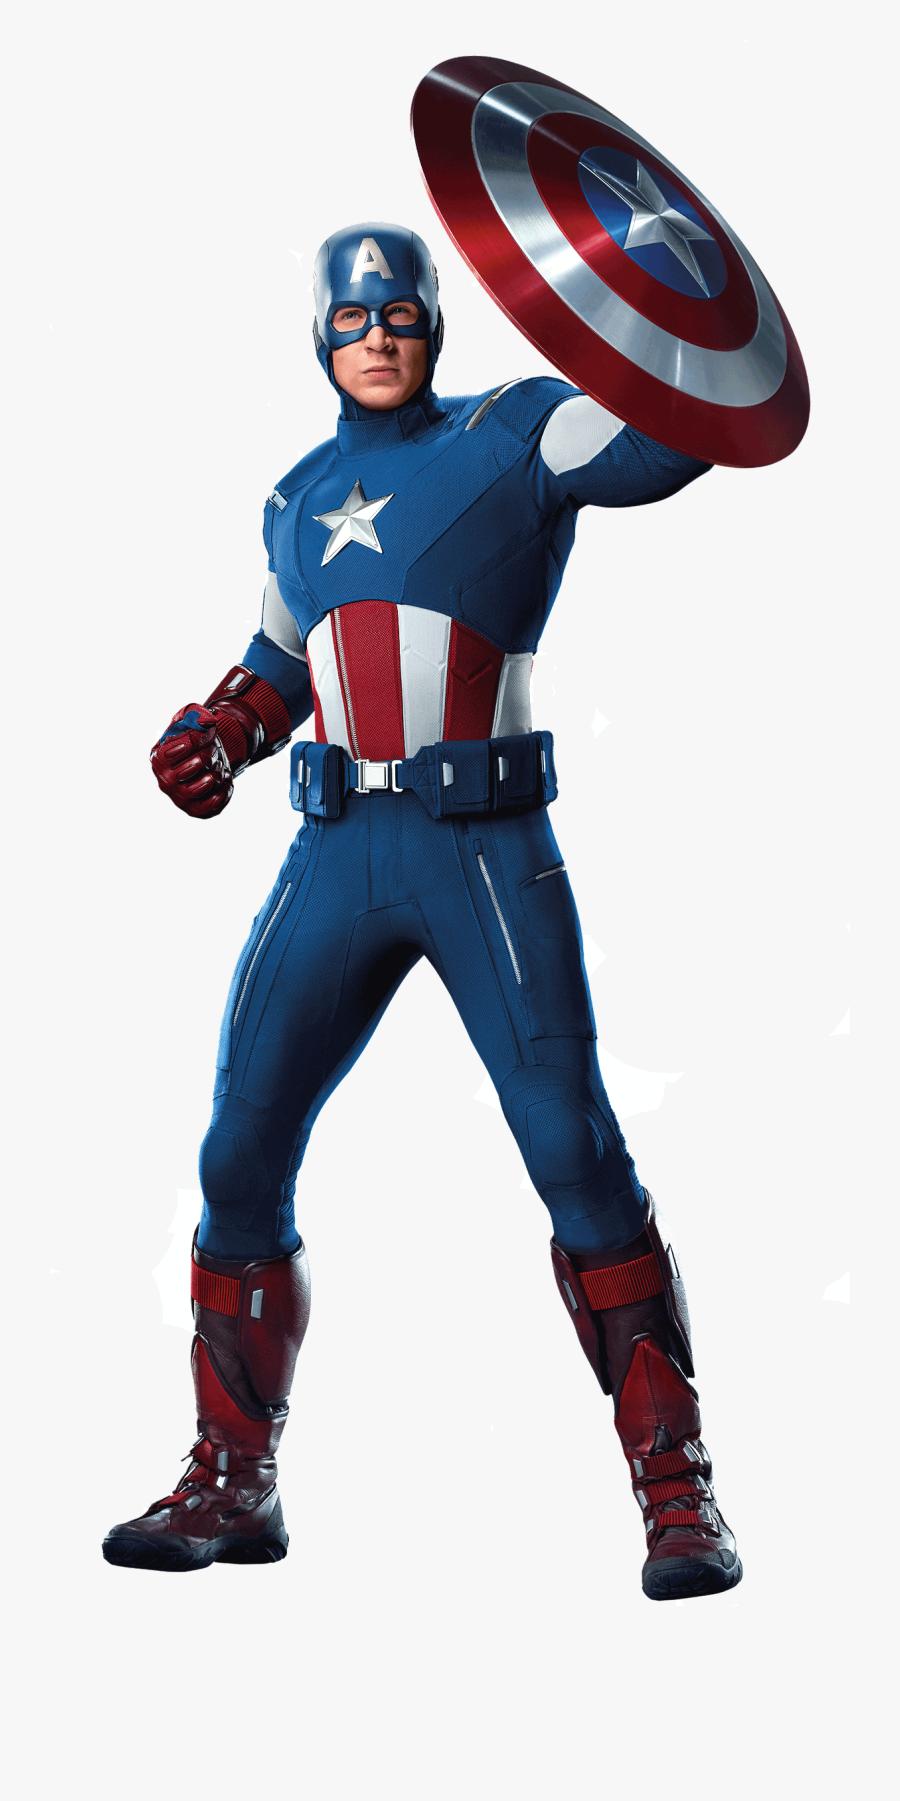 Captain America Team Png - Captain America Avengers 2012, Transparent Clipart